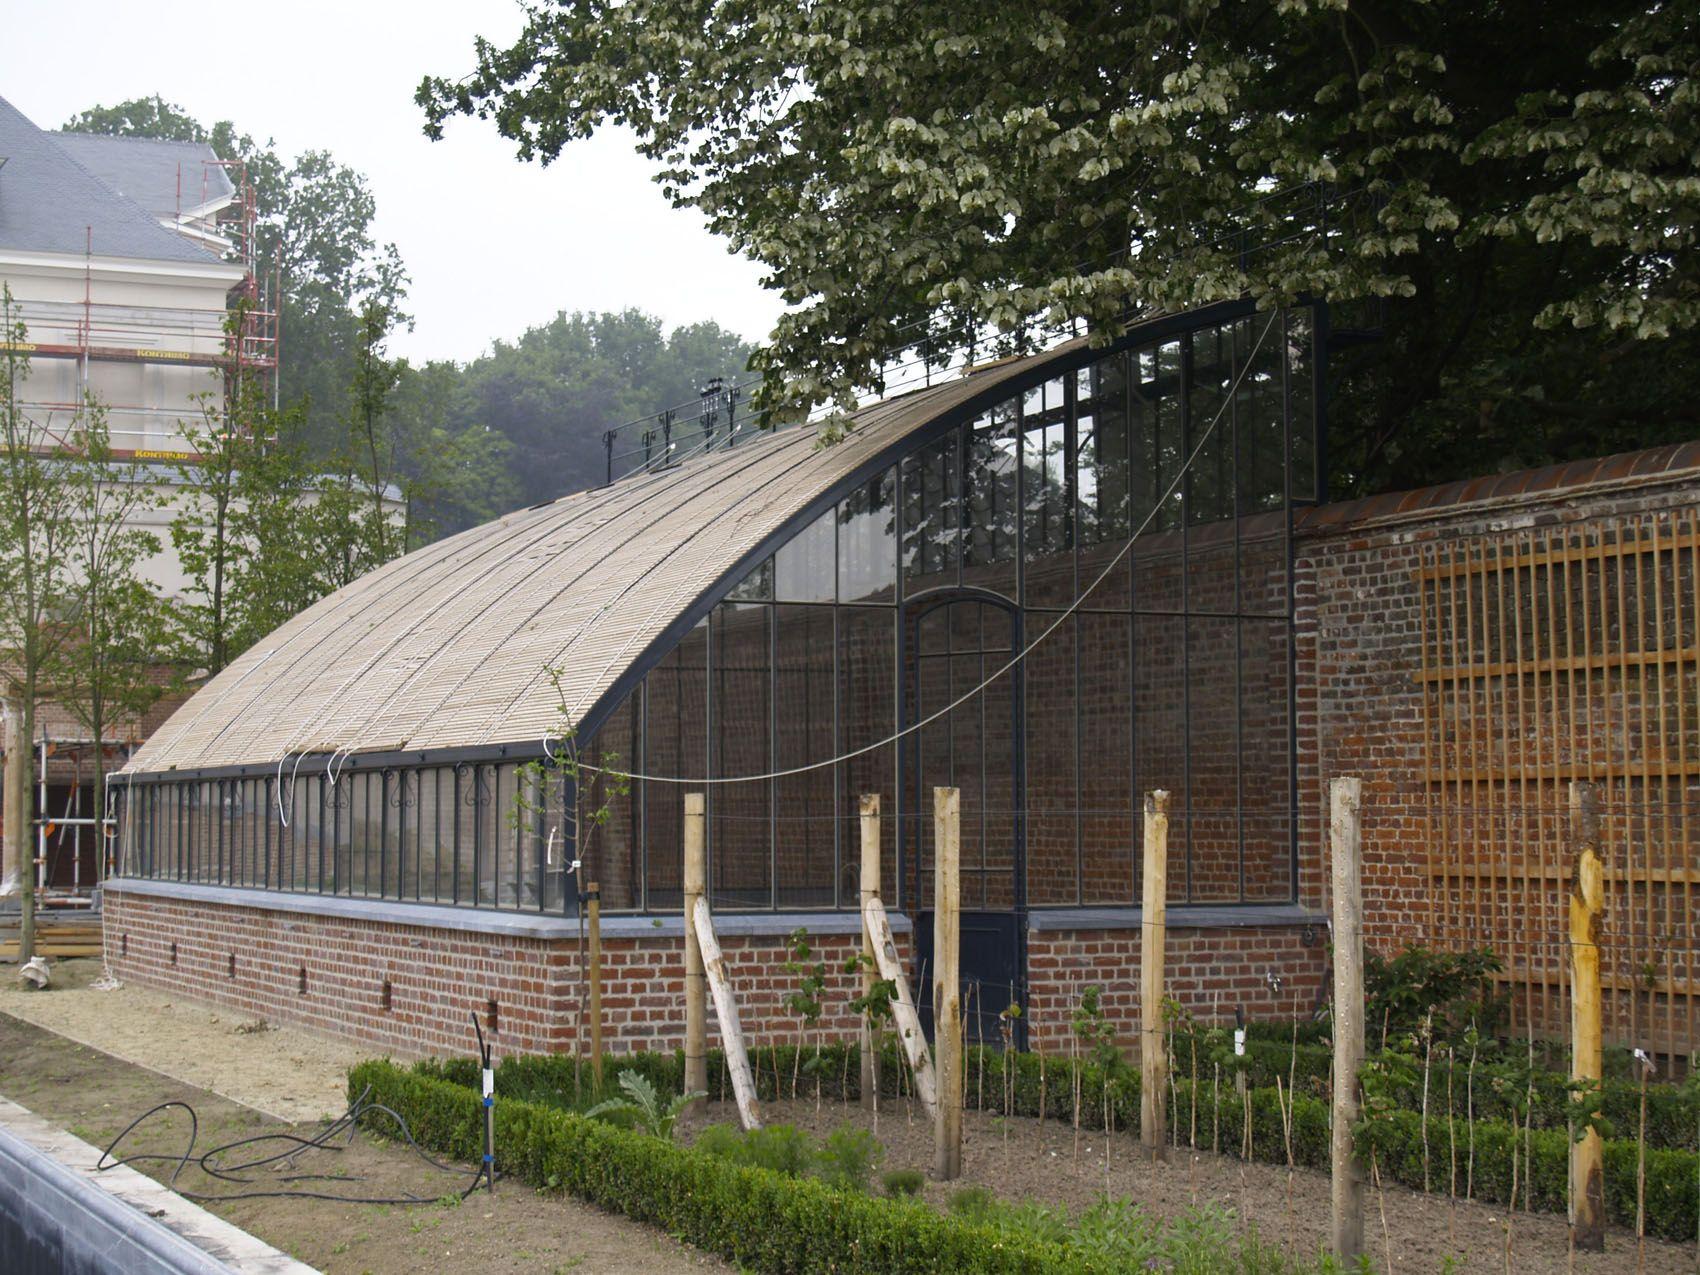 Serre adoss e acier 2 jardin bucolique pinterest projets - Serre adossee ancienne ...